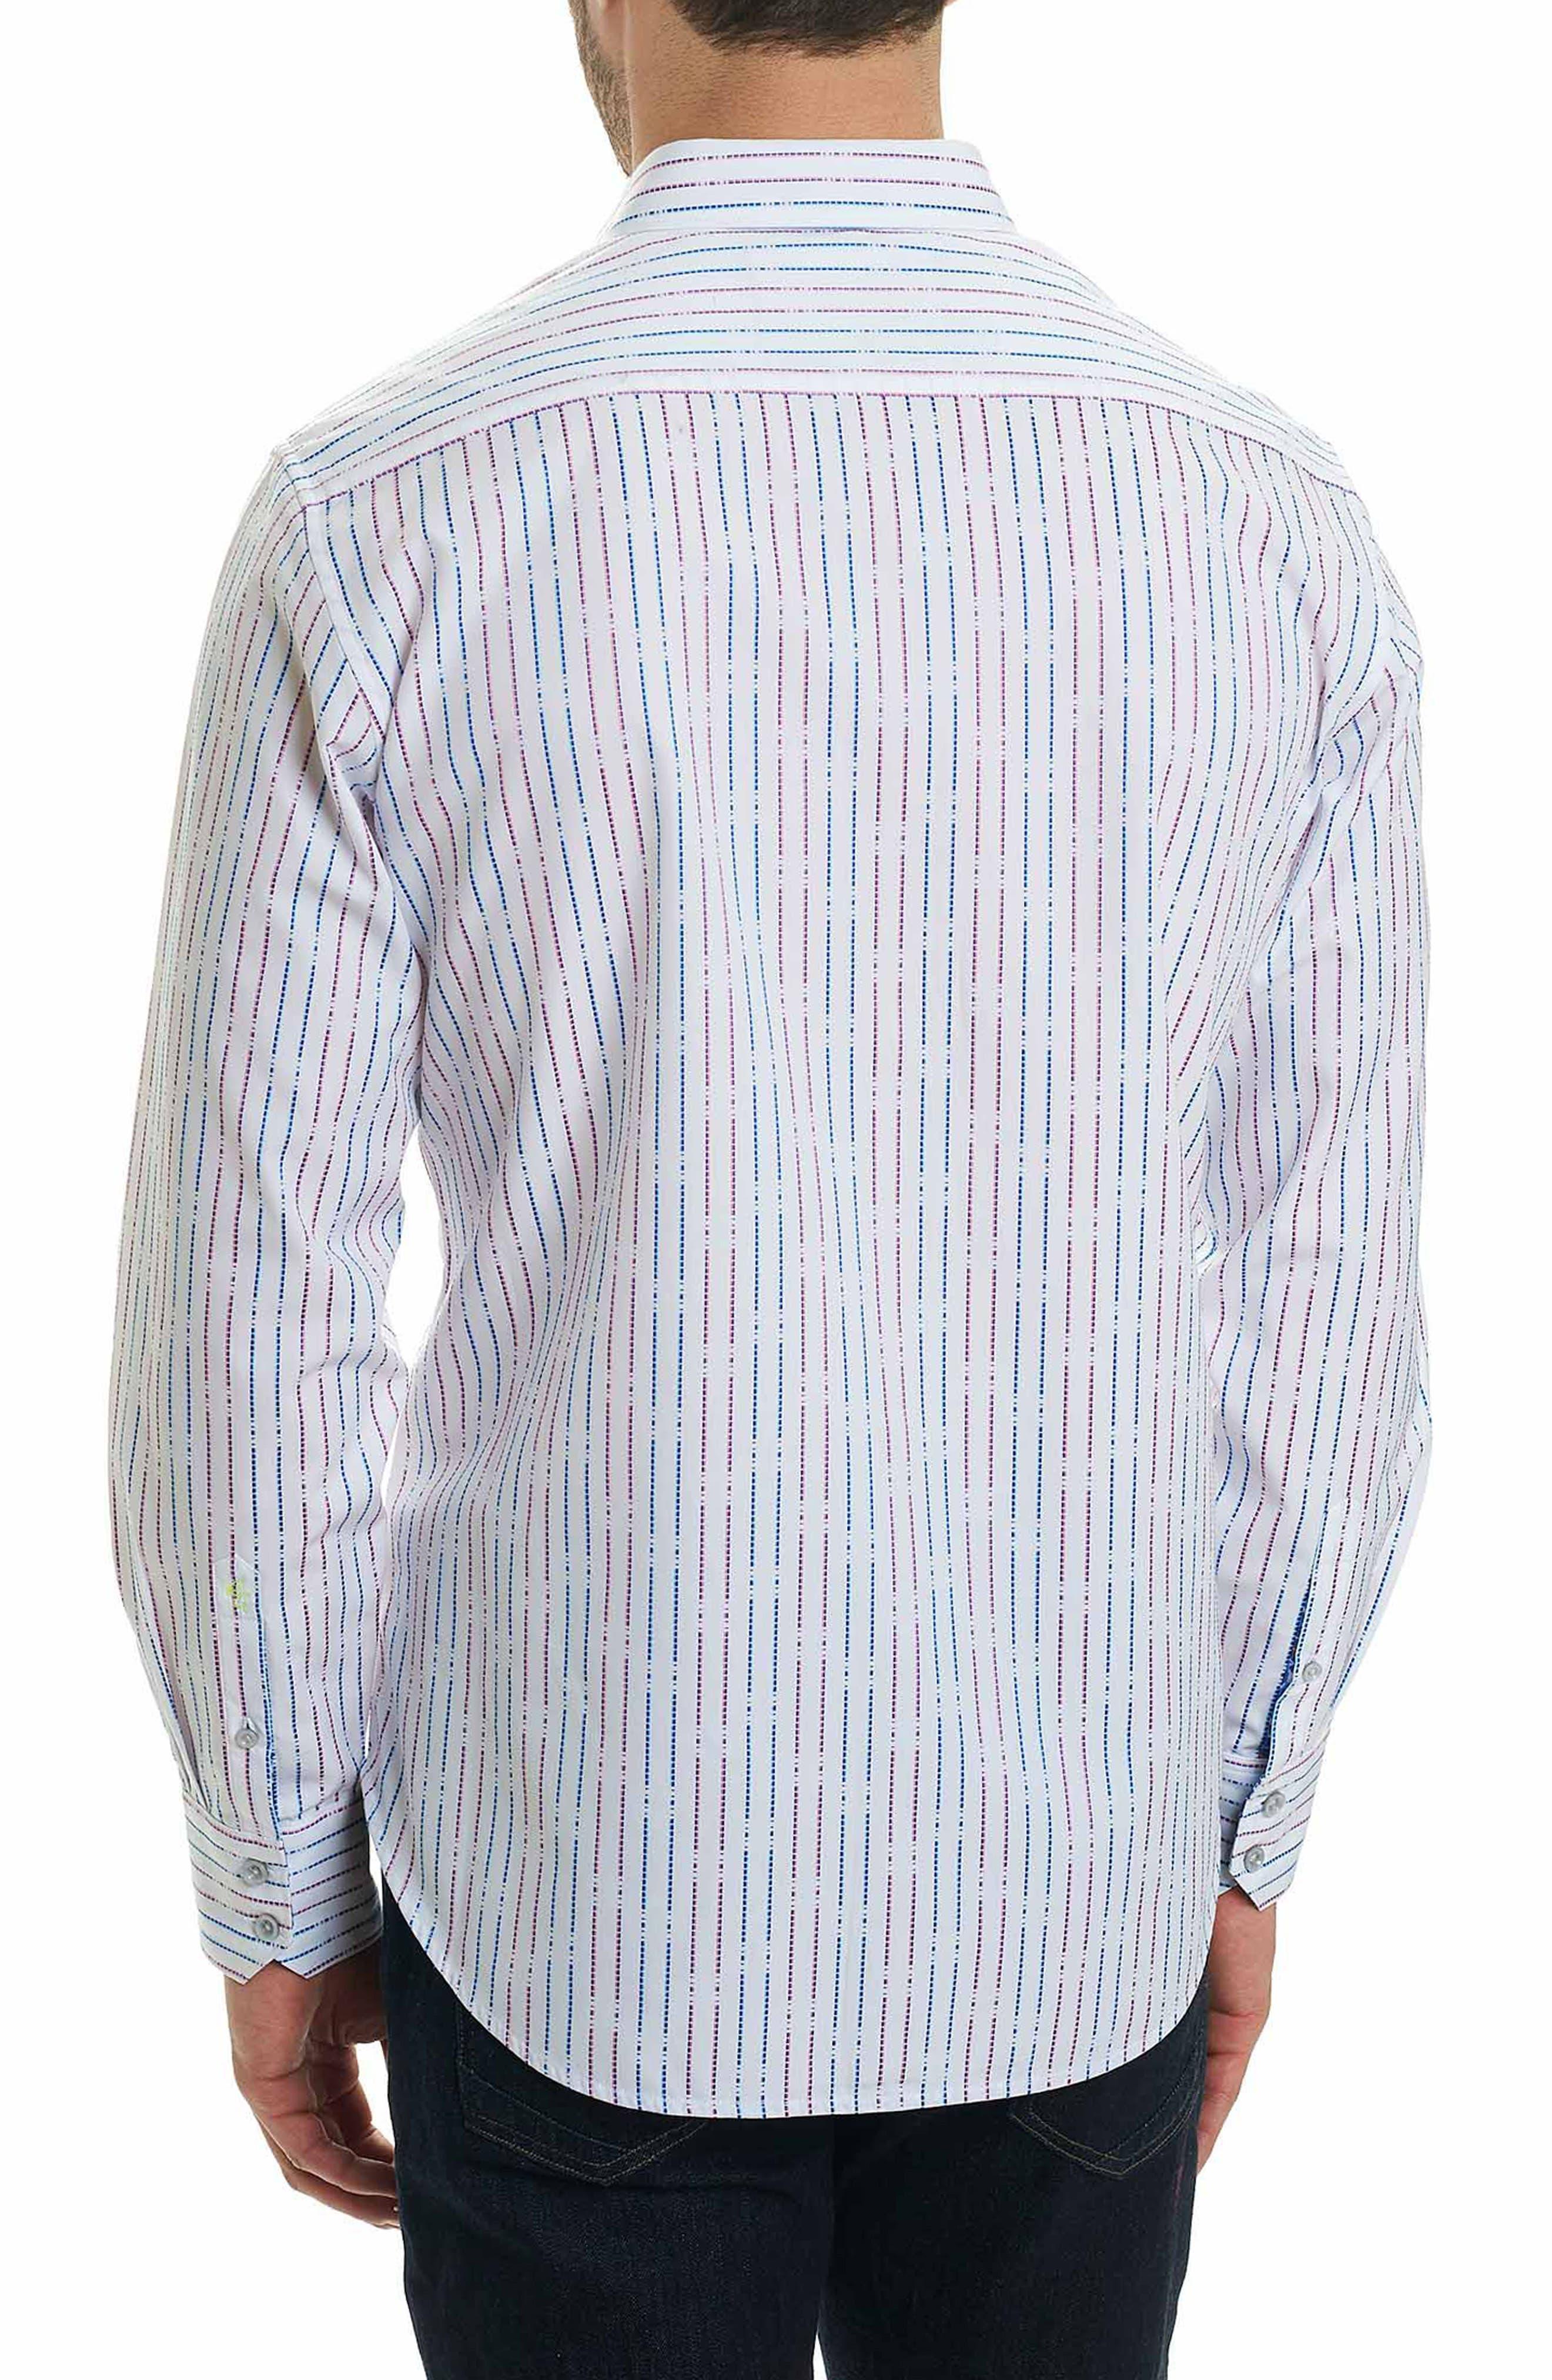 Bora Classic Fit Sport Shirt,                             Alternate thumbnail 2, color,                             100